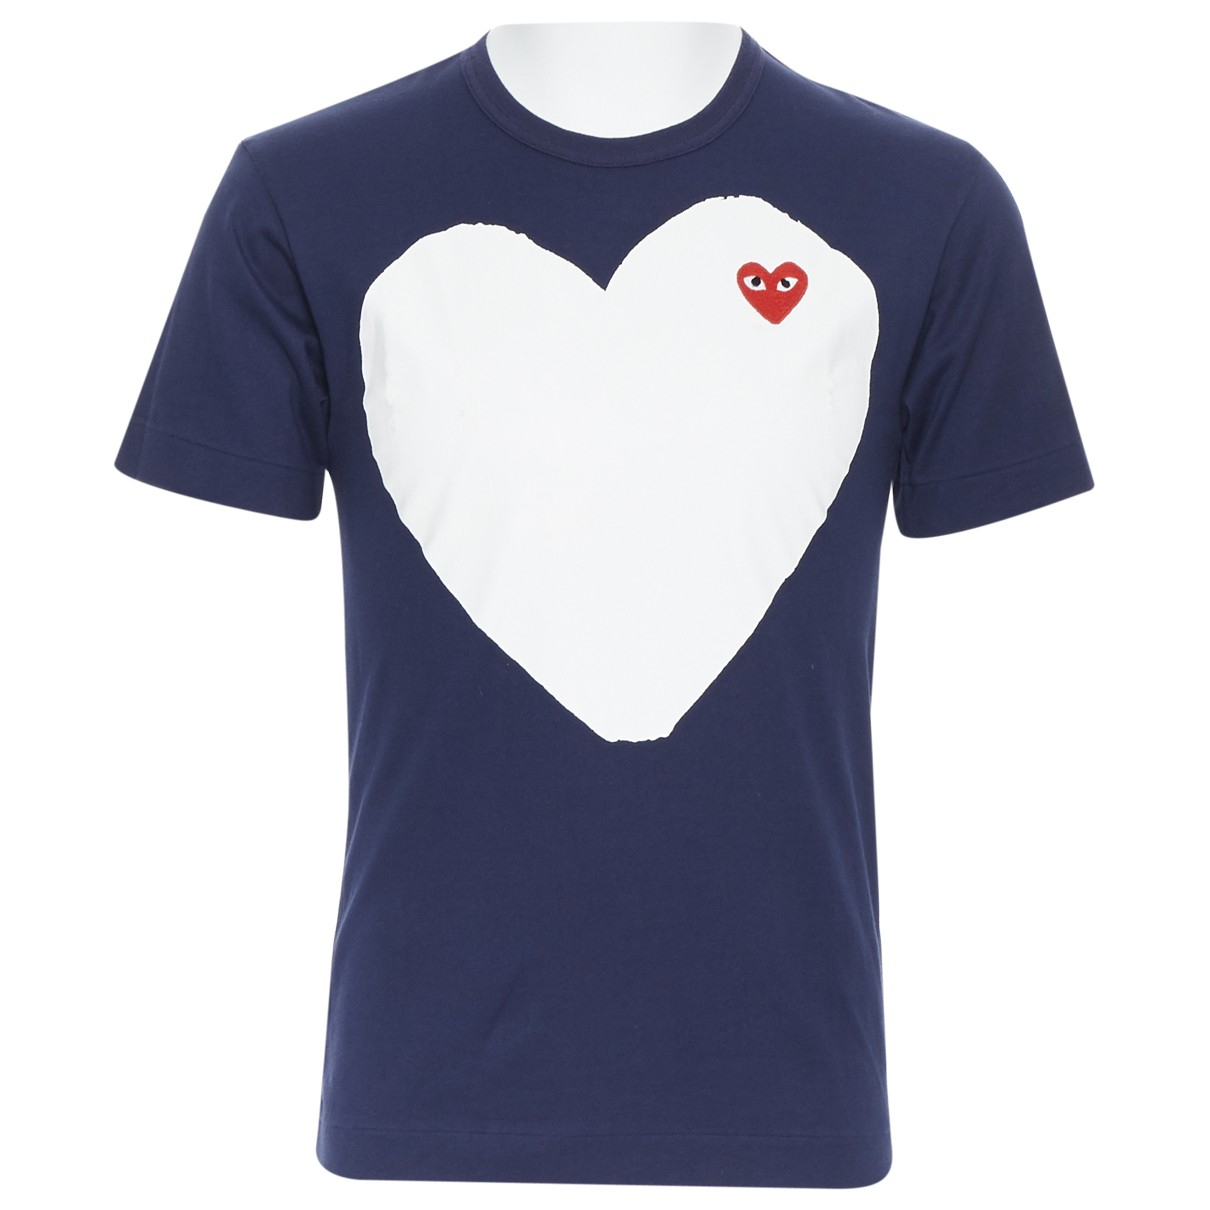 Comme Des Garcons \N Navy Cotton T-shirts for Men S International